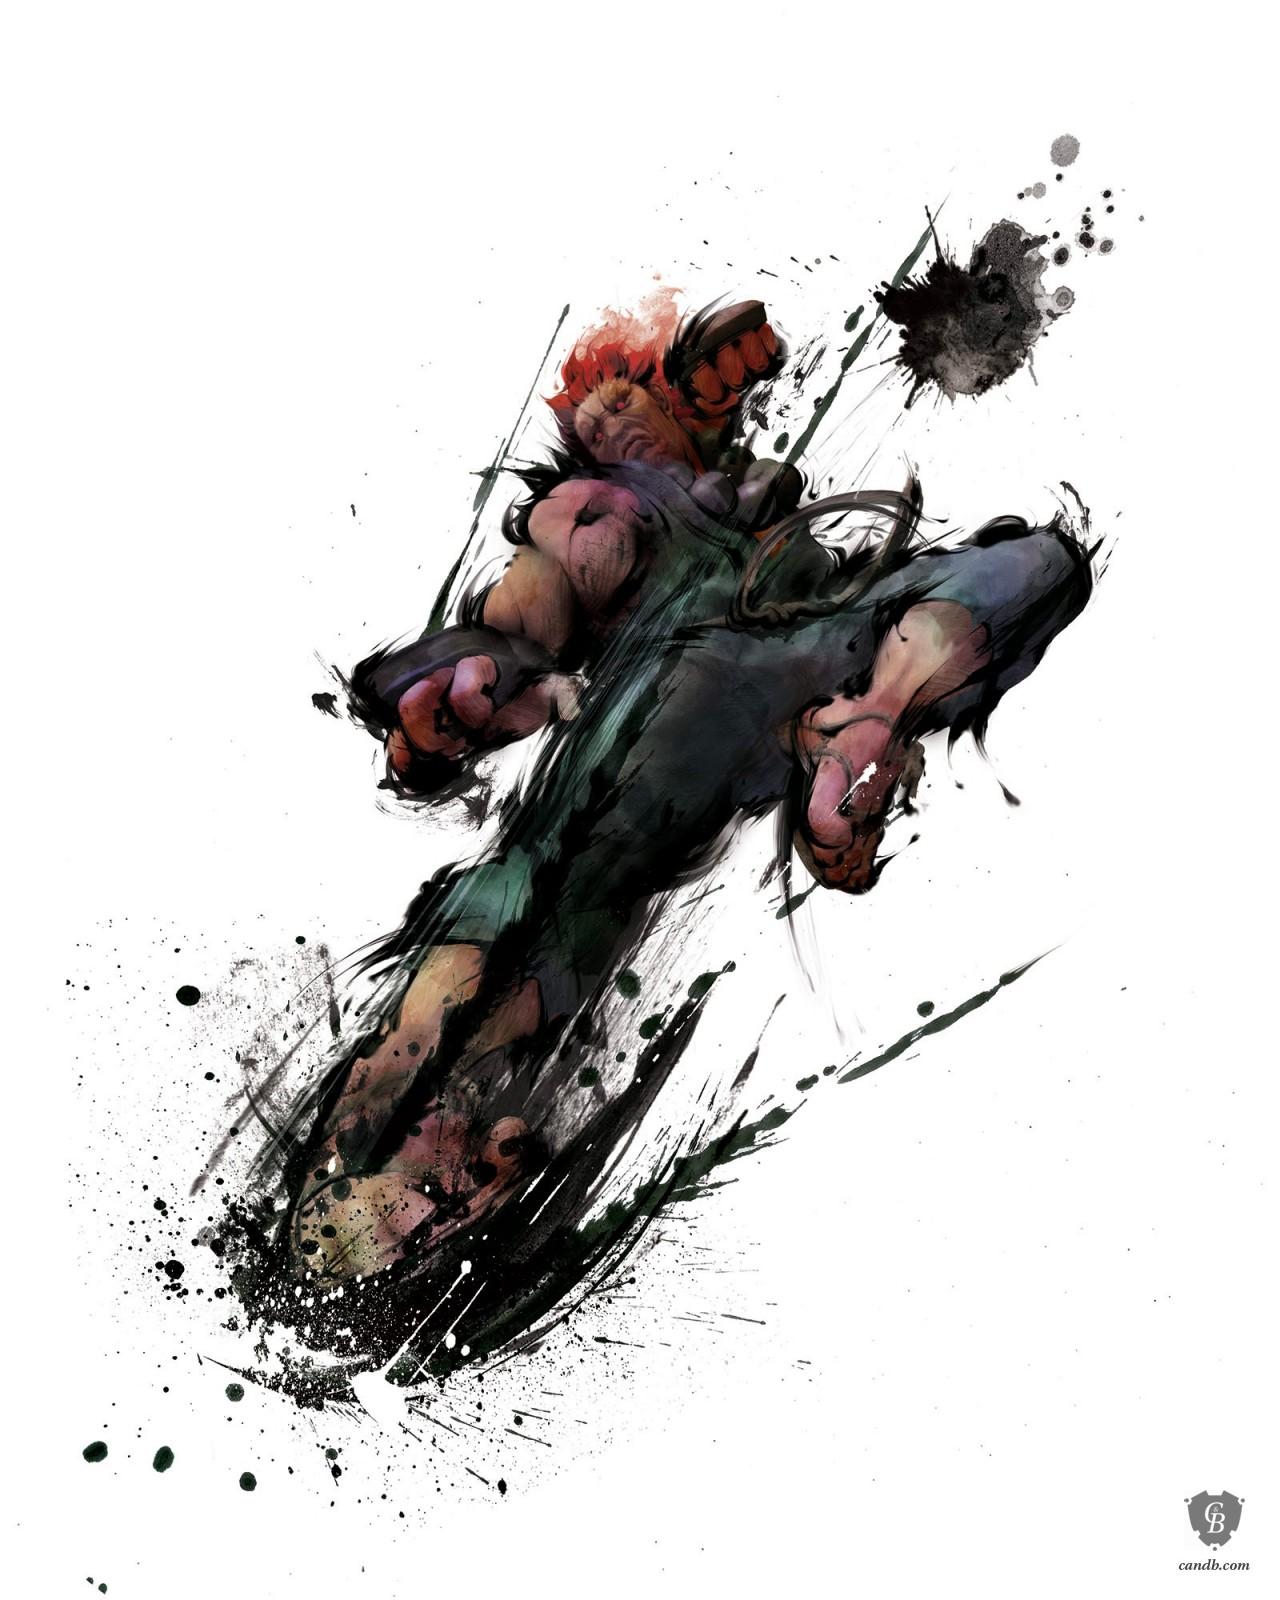 akuma-street-fighter-iv-capcomv1_1280x16